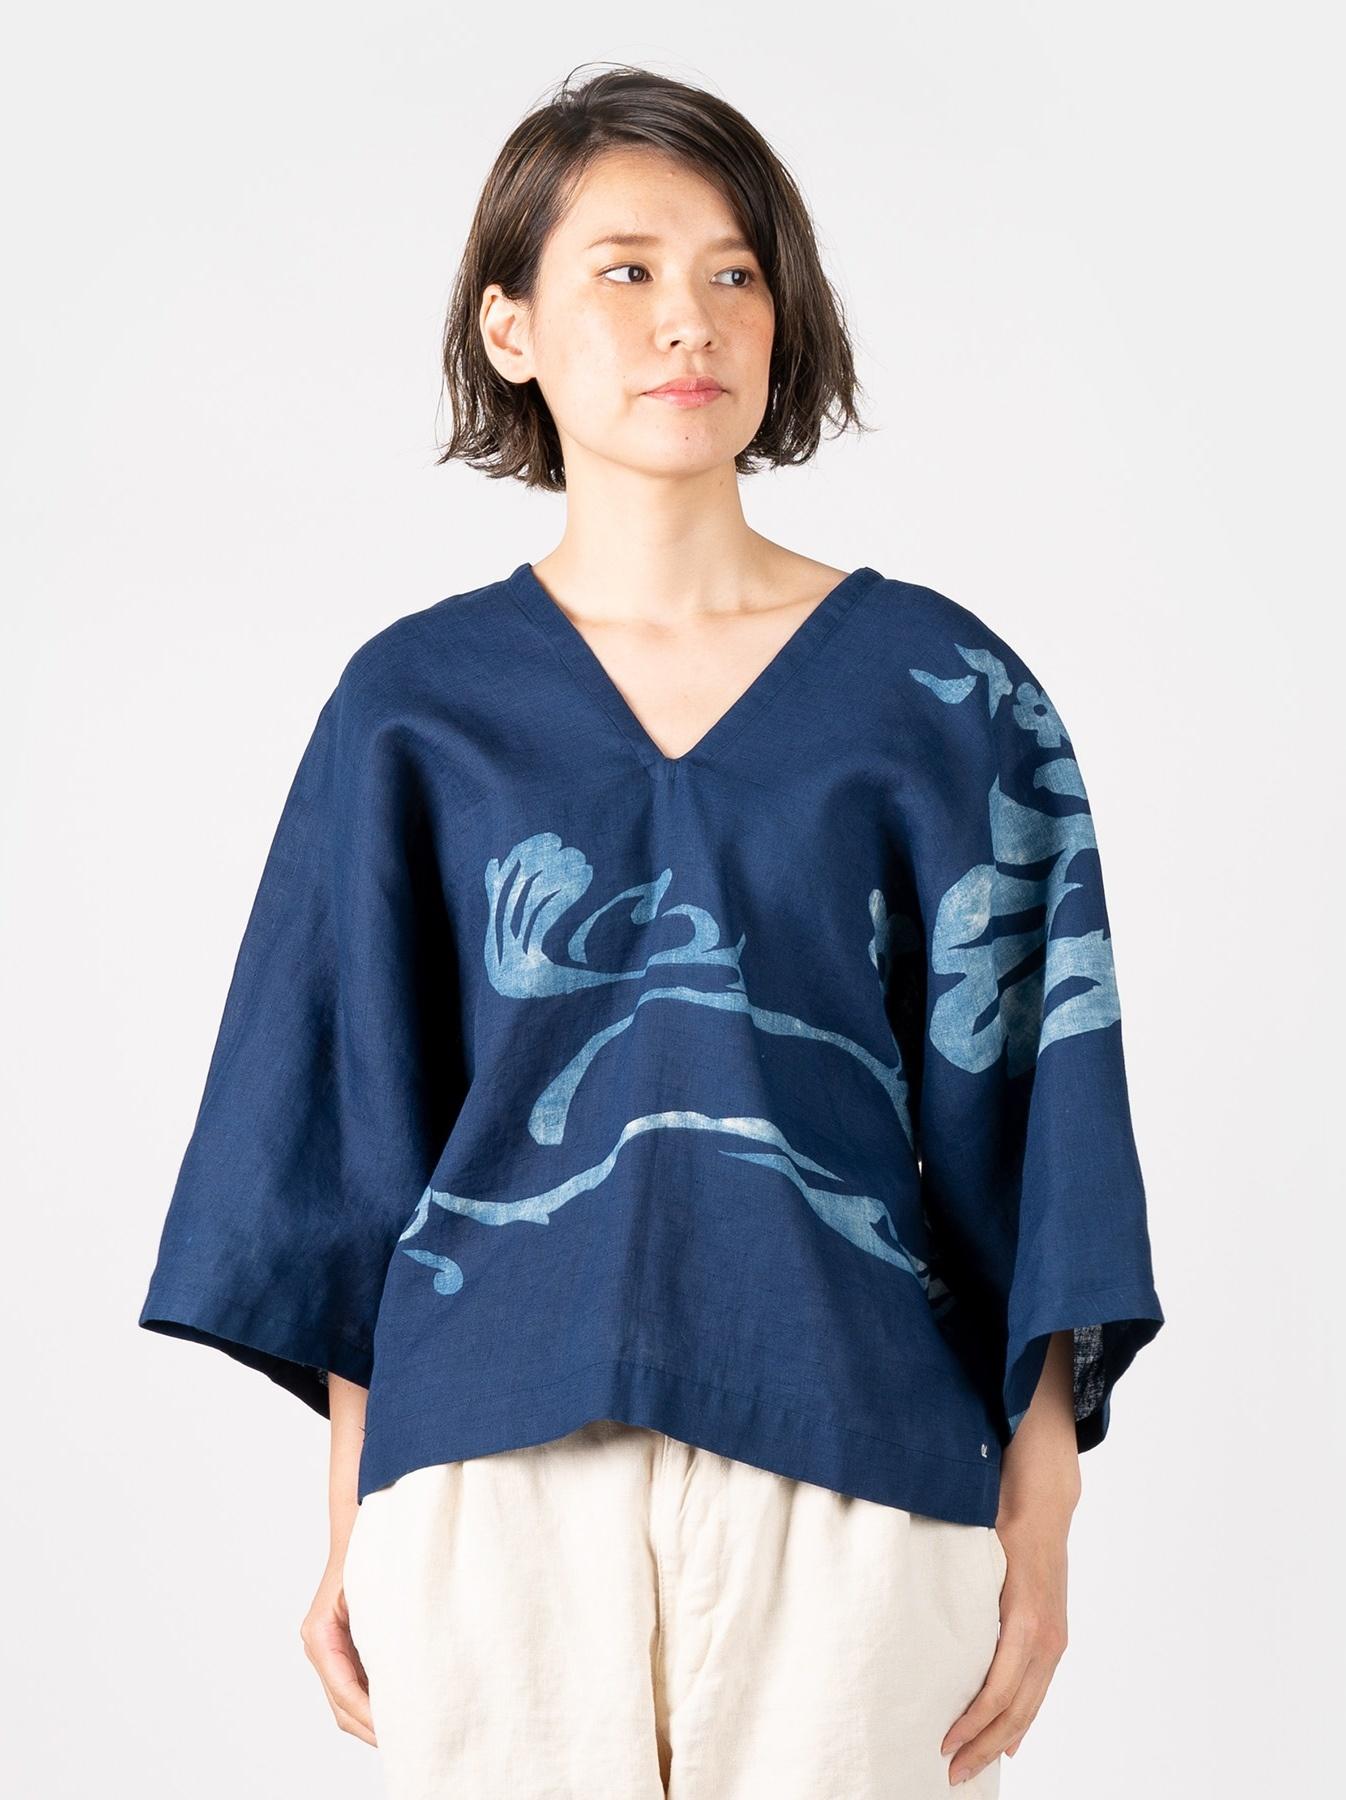 WH Indigo W-cloth Umiiloha Blouse-1